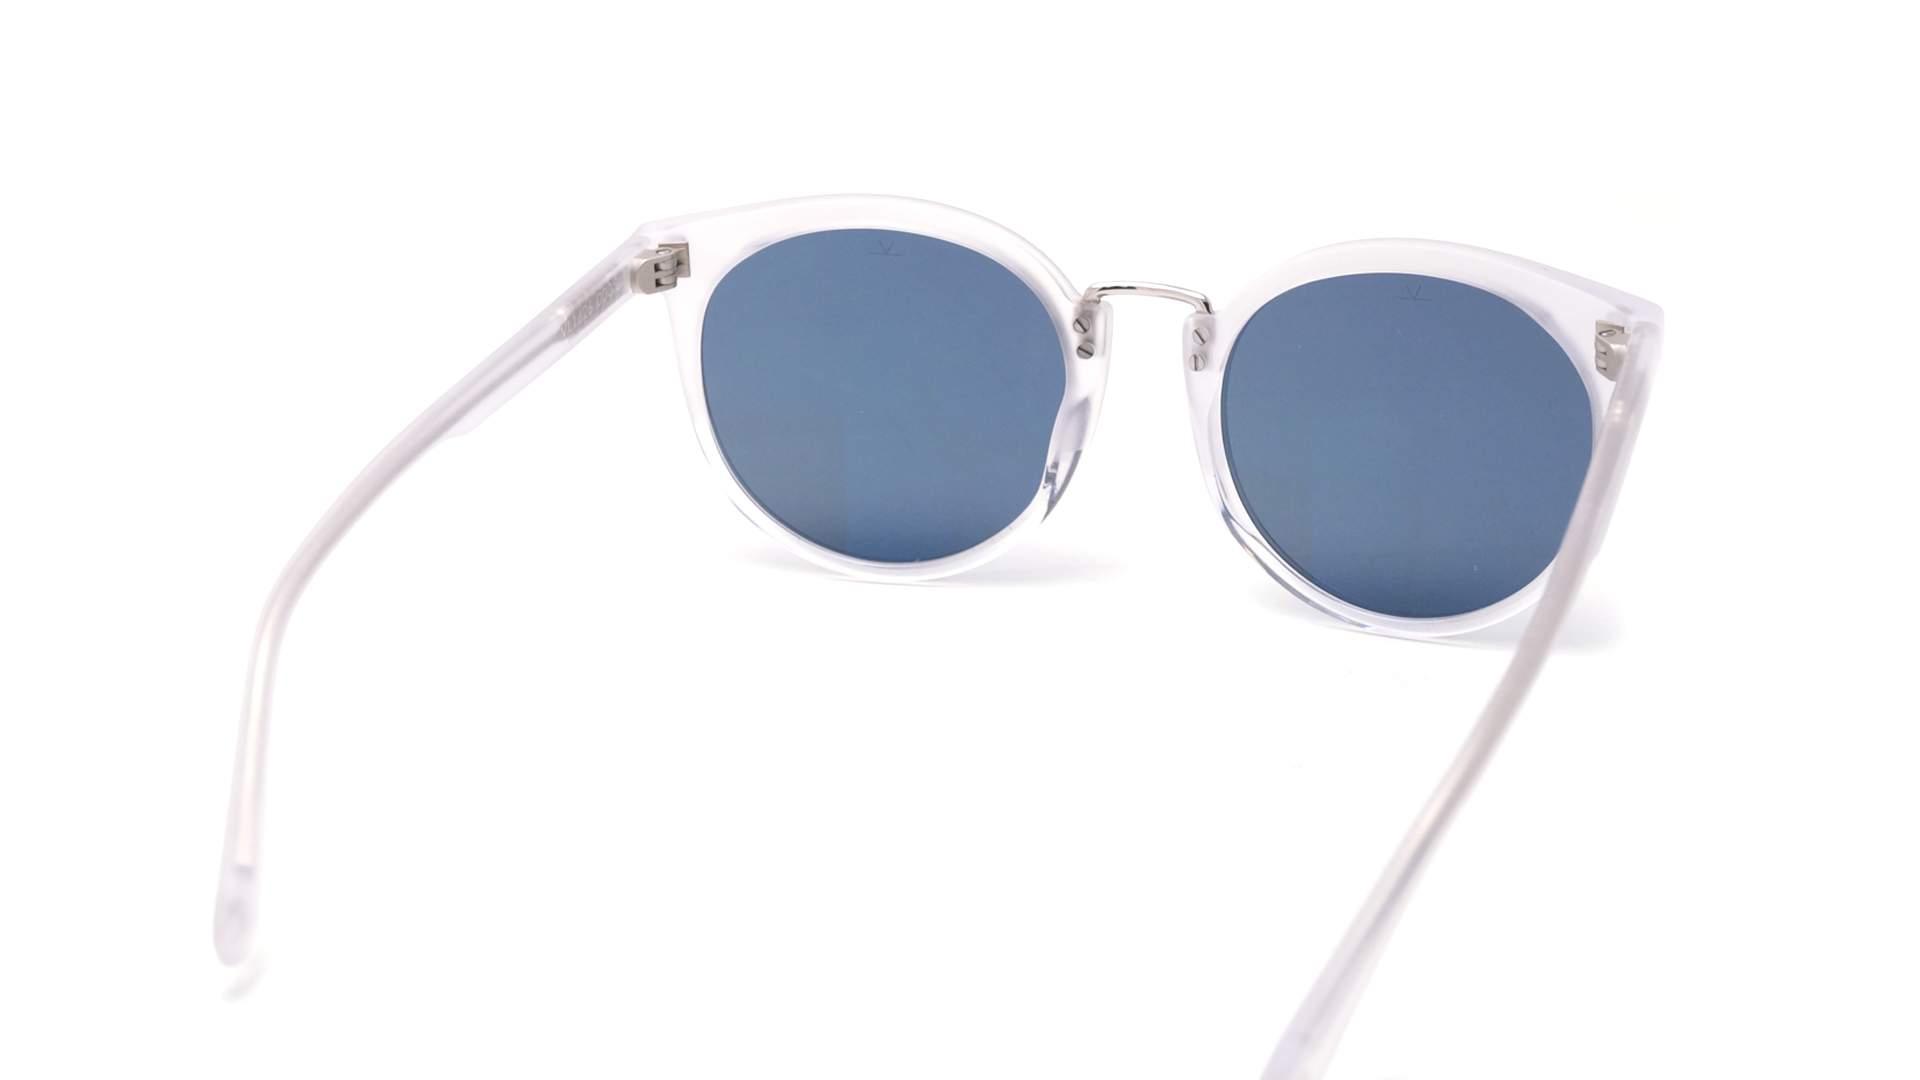 cd0f851c4827 Sunglasses Vuarnet Cable Car Cat eye Clear Matte Blue polar VL1626 0005  52-11 Small Polarized